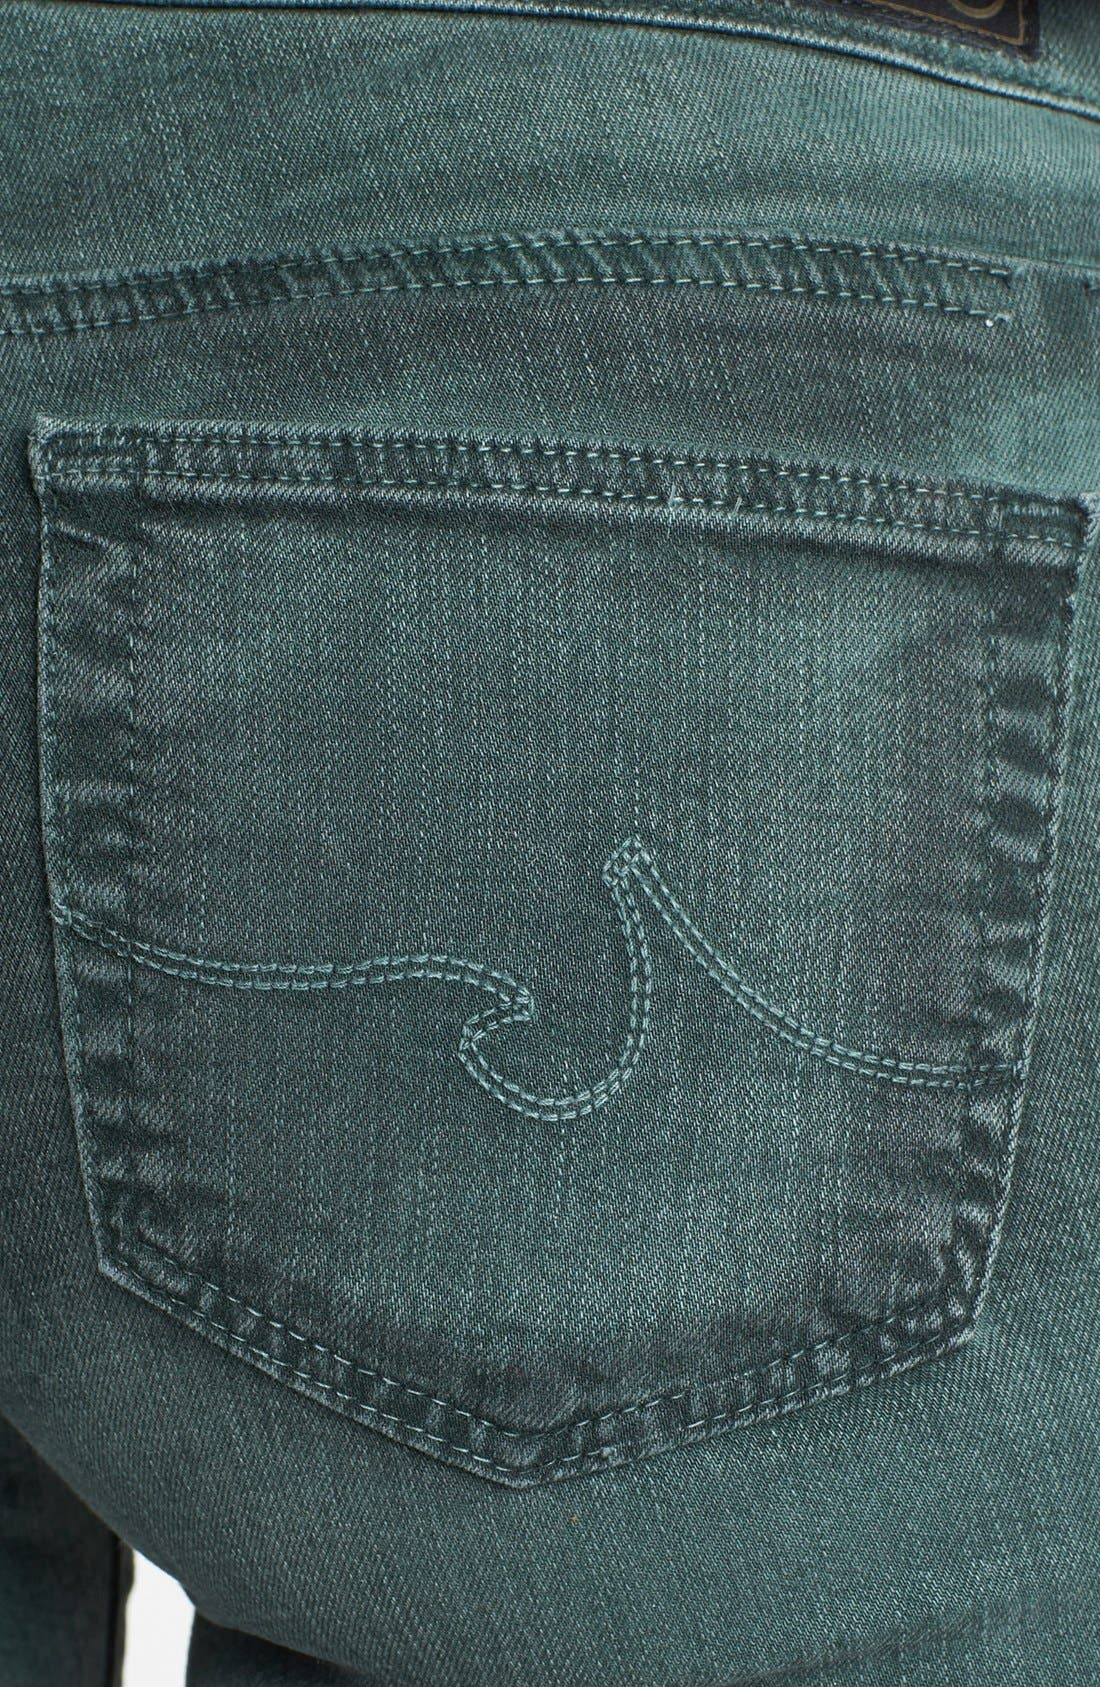 Alternate Image 2  - AG 'The Absolute Legging' Skinny Jeans (Storm Winter Green)